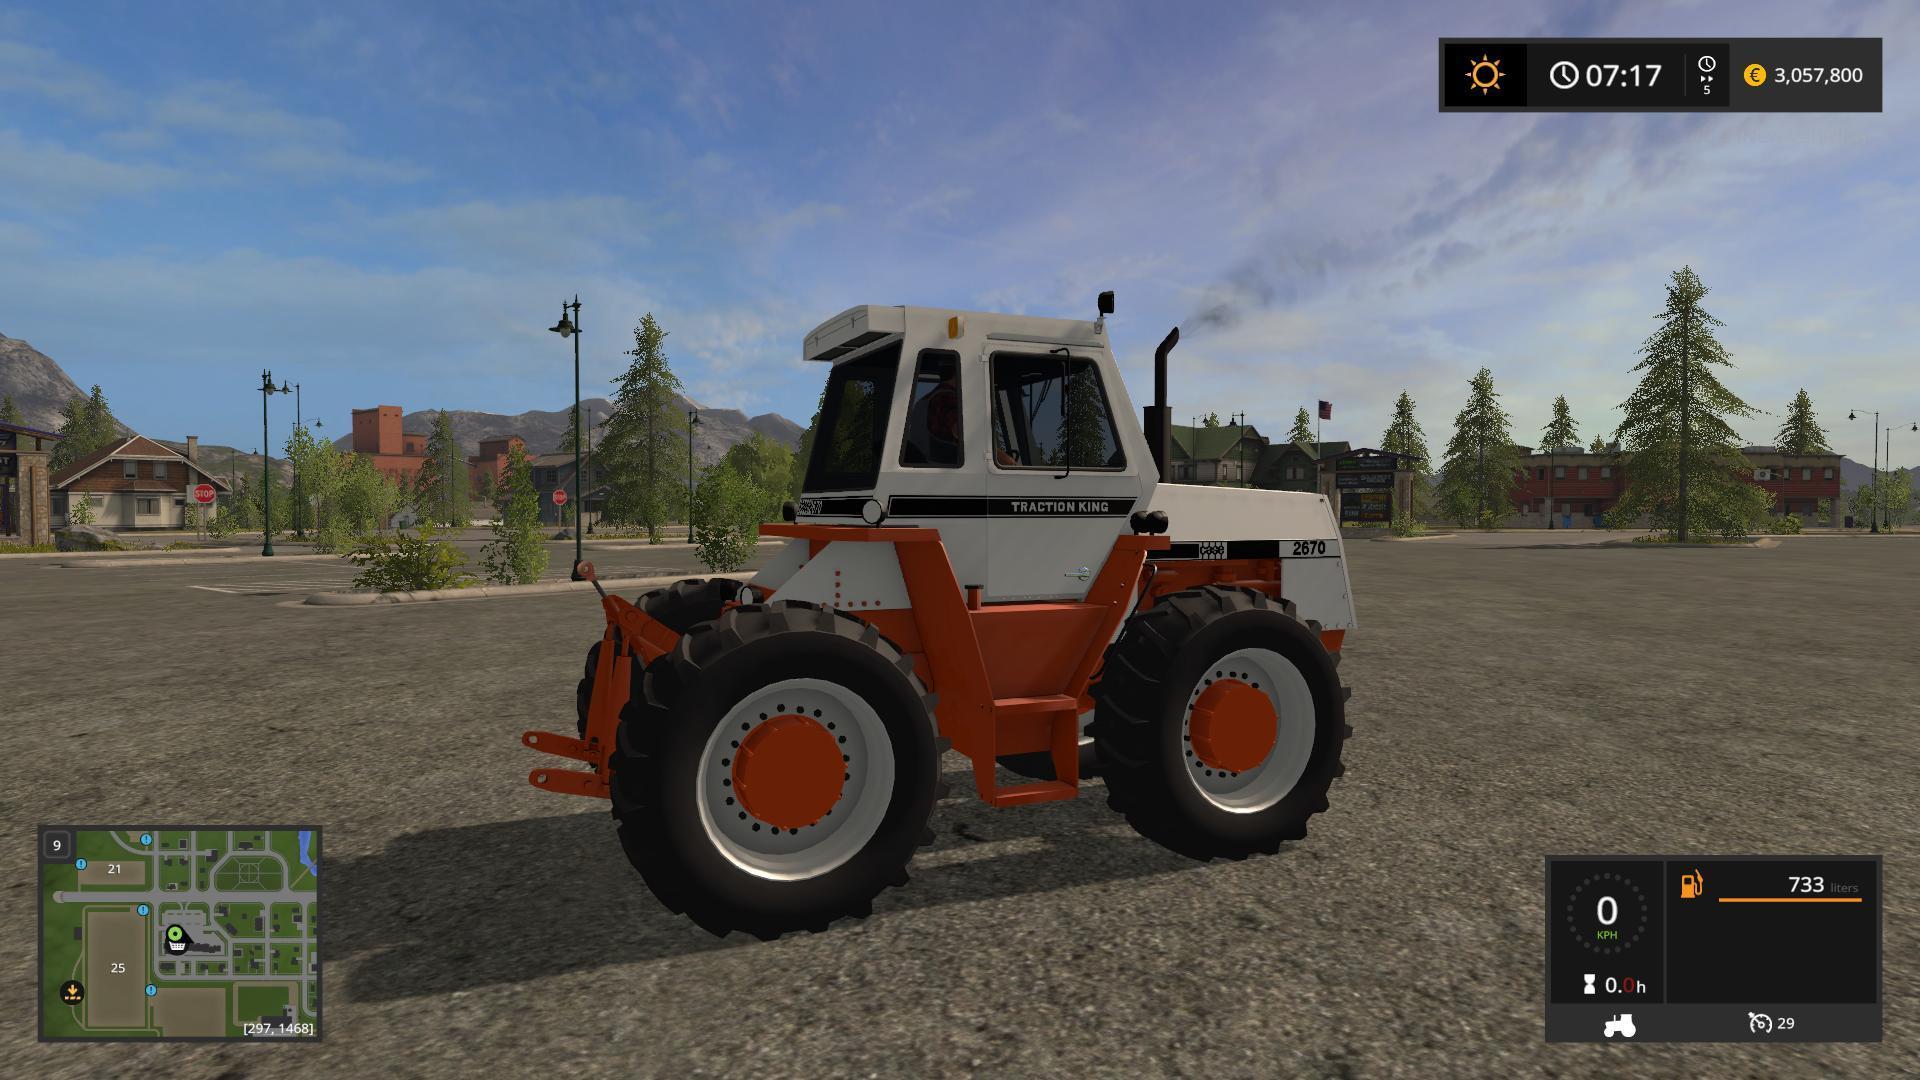 OLD IRON CASE 2670 V1 0 for FS17 - Farming Simulator 2017 mod, FS 17